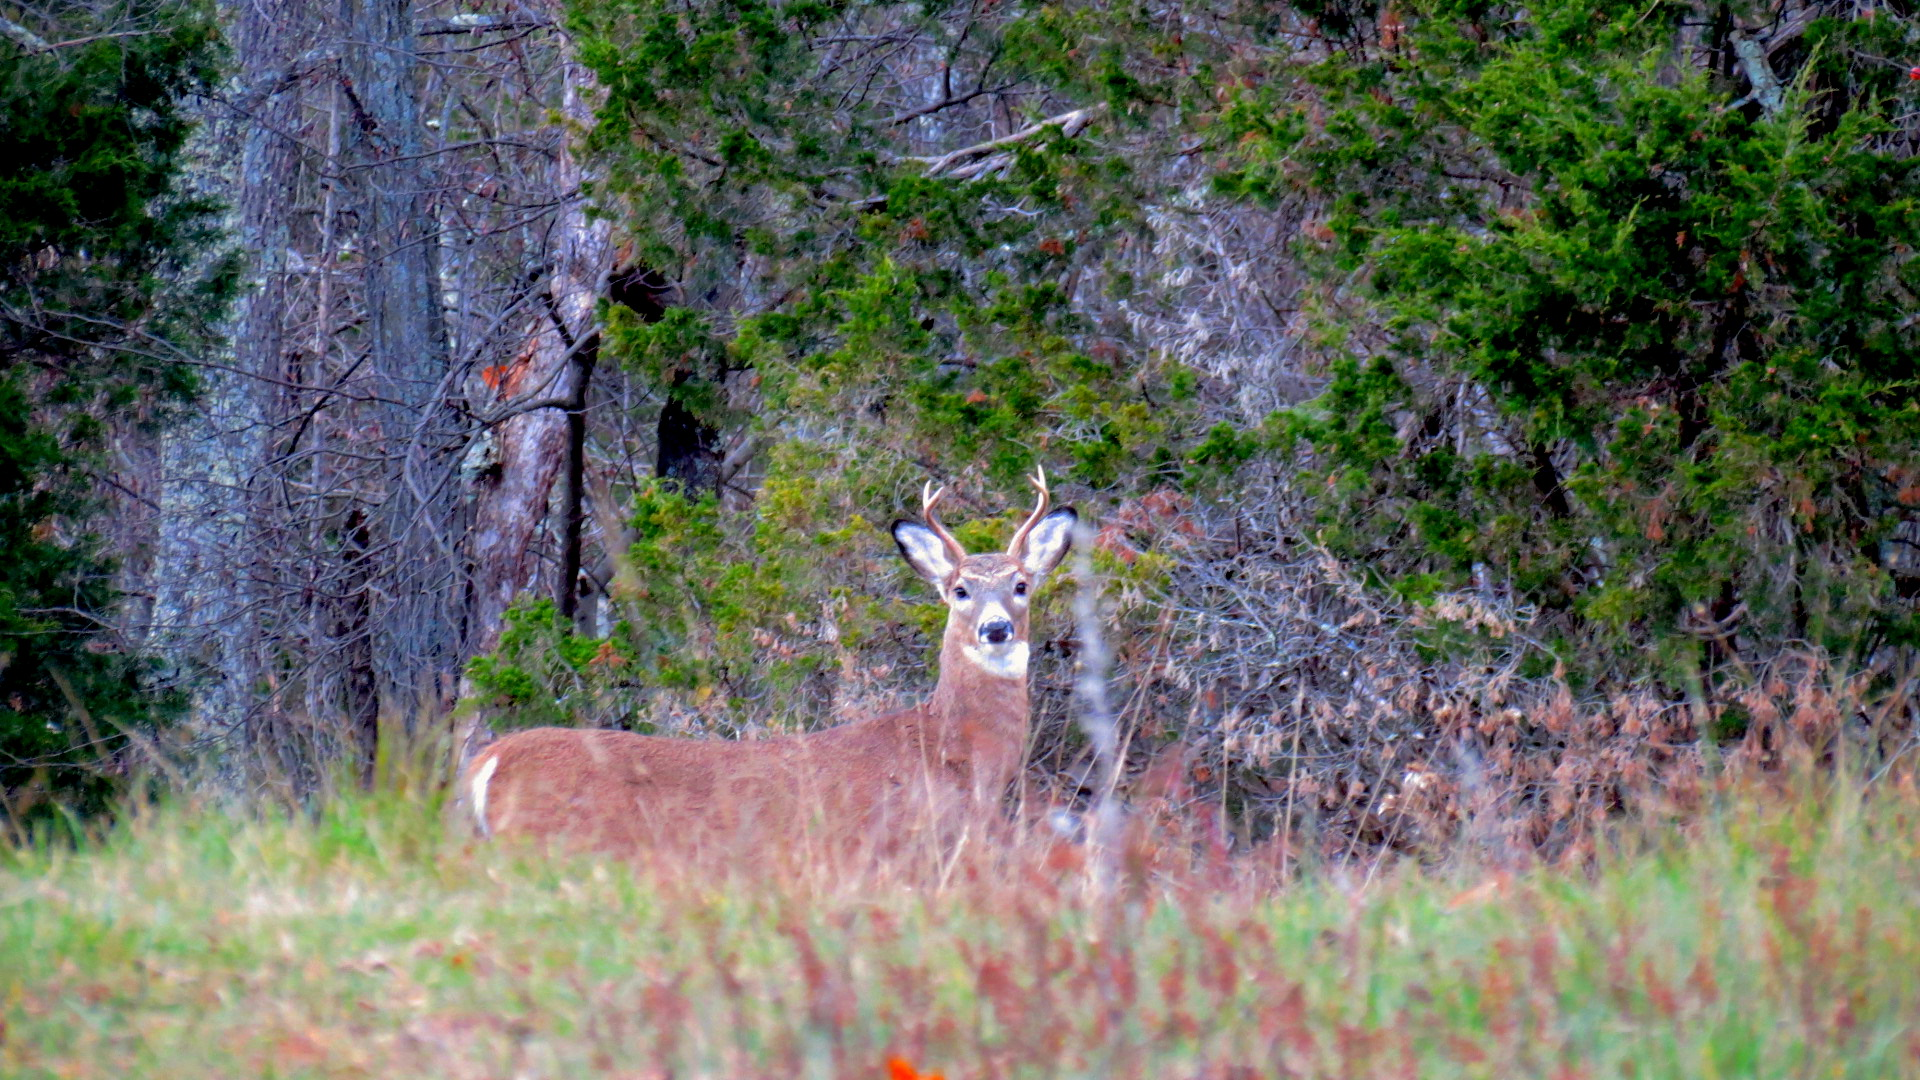 deer1_West Virginia, Hampshire County 09.2013 TracyLind.JPG